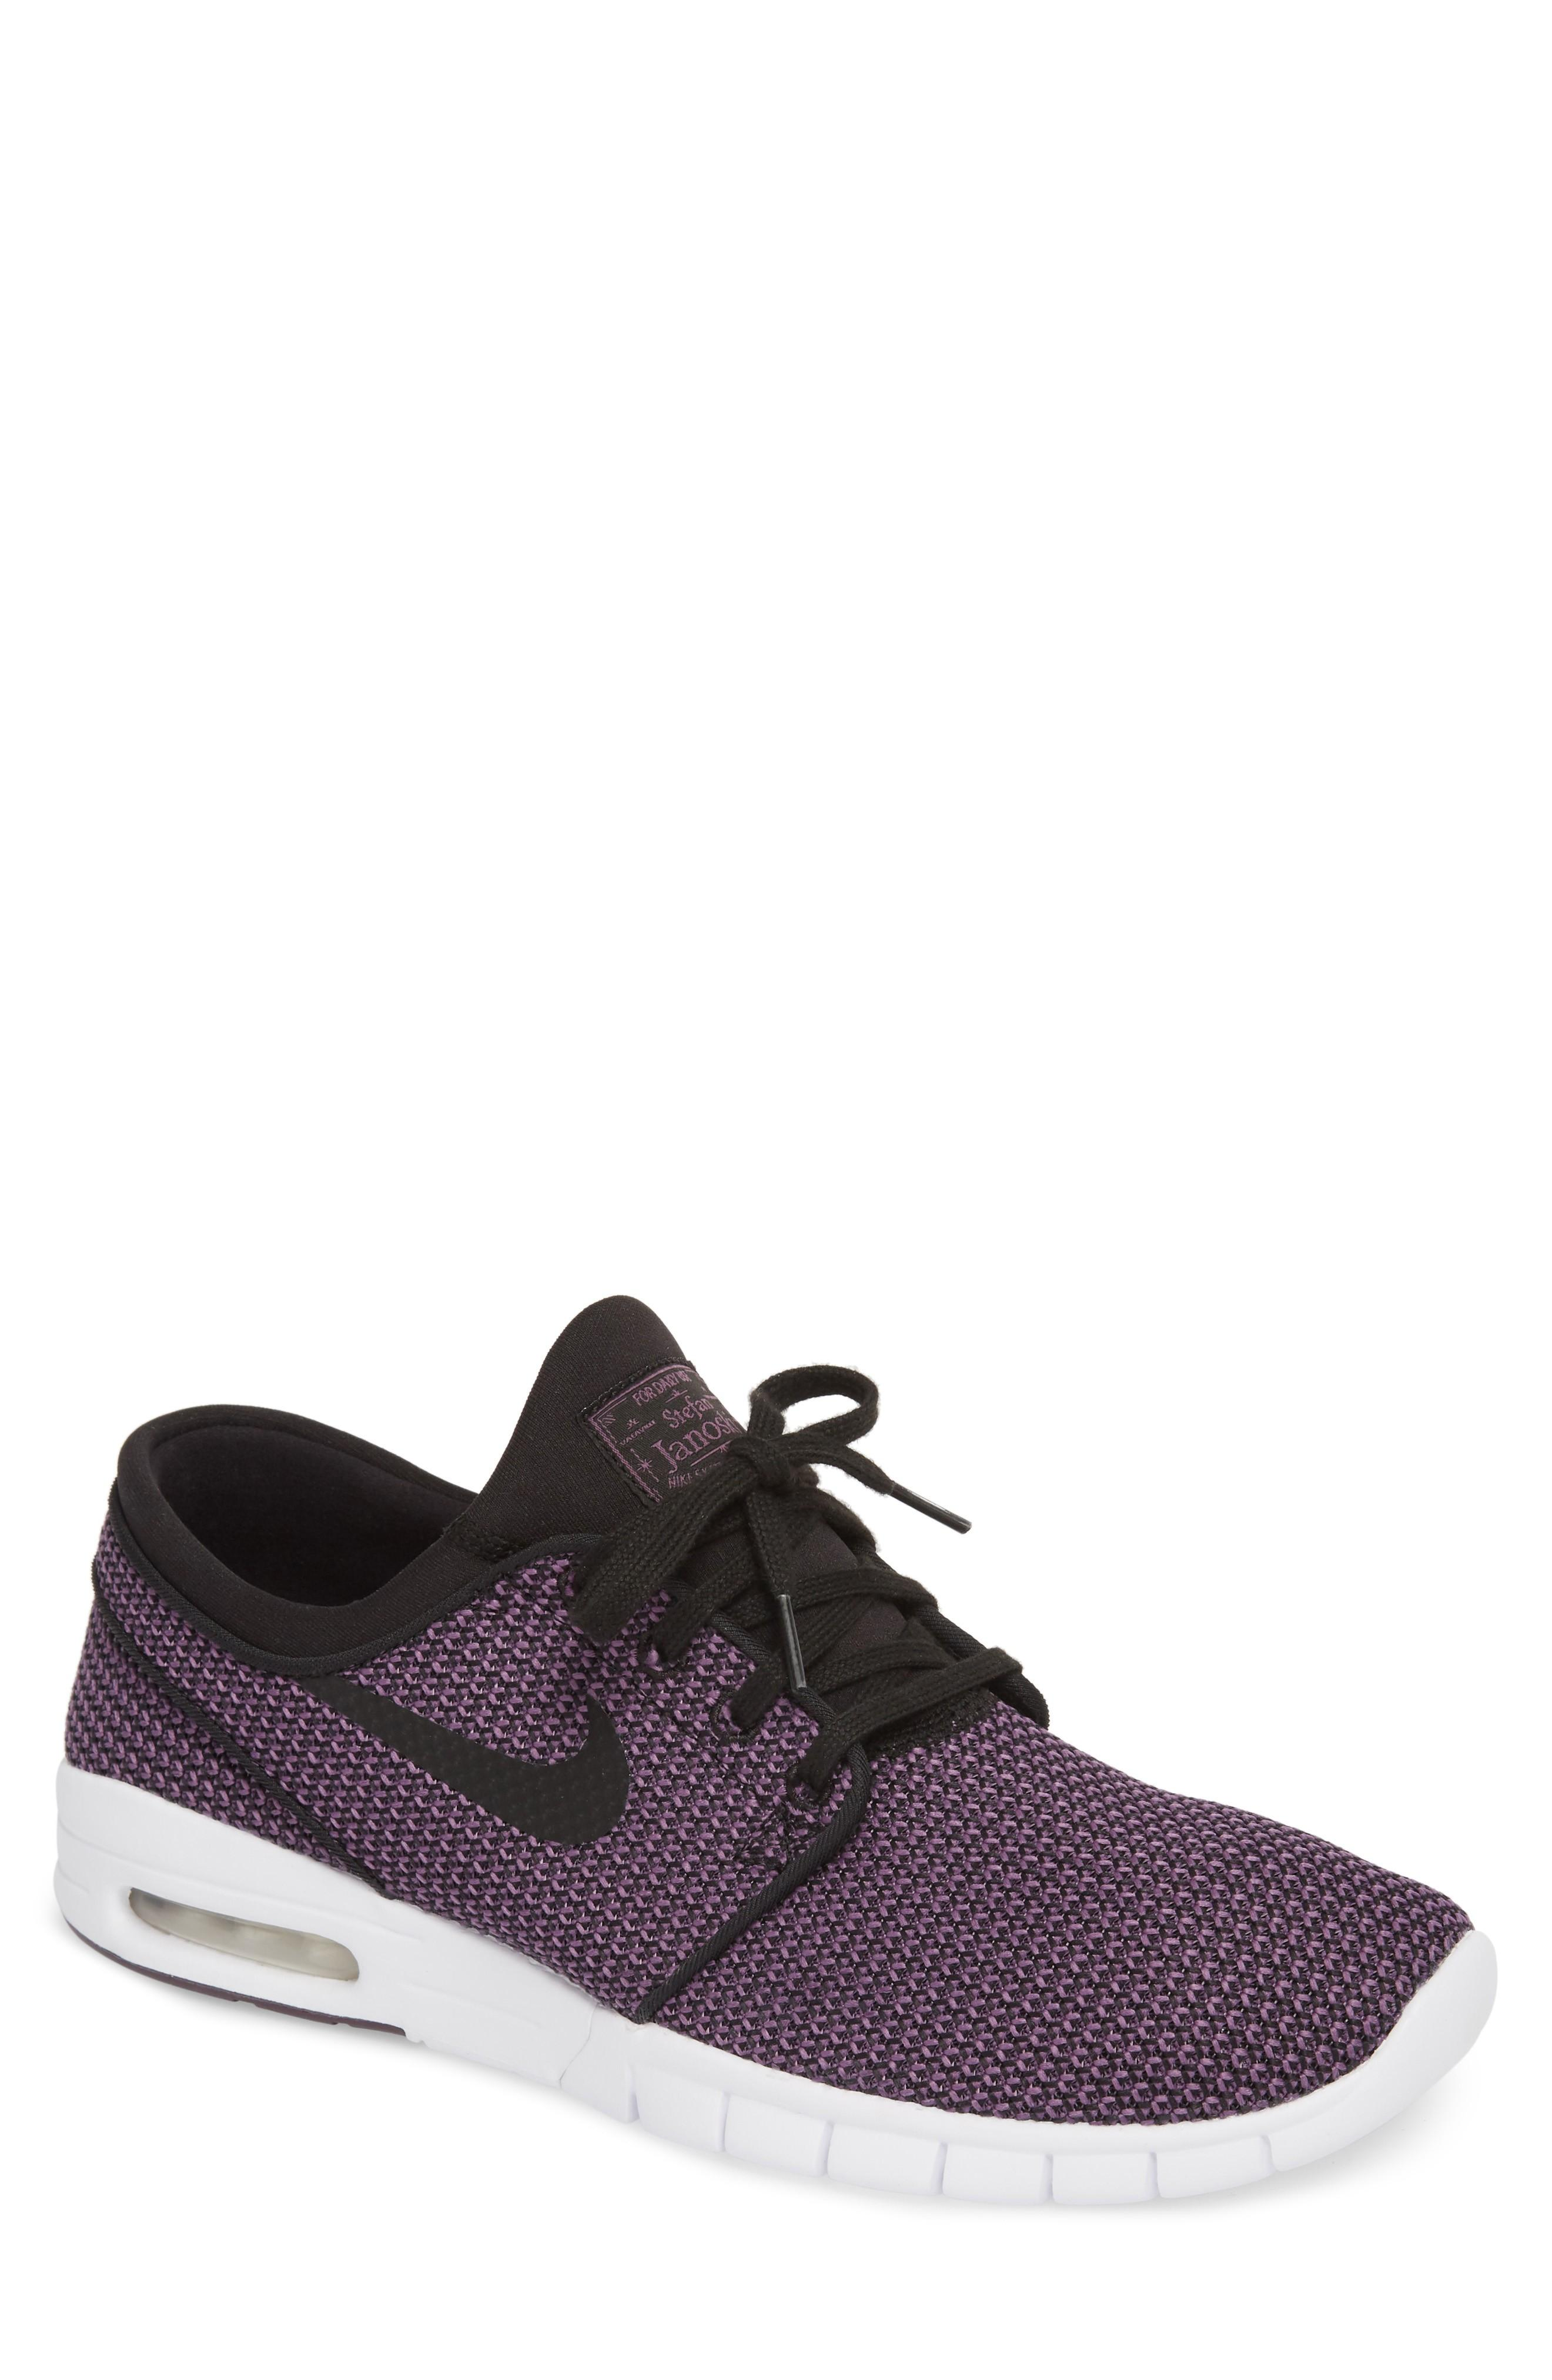 4344021f1420 NIKE.  Stefan Janoski - Max Sb  Skate Shoe in Black  Pro Purple  White